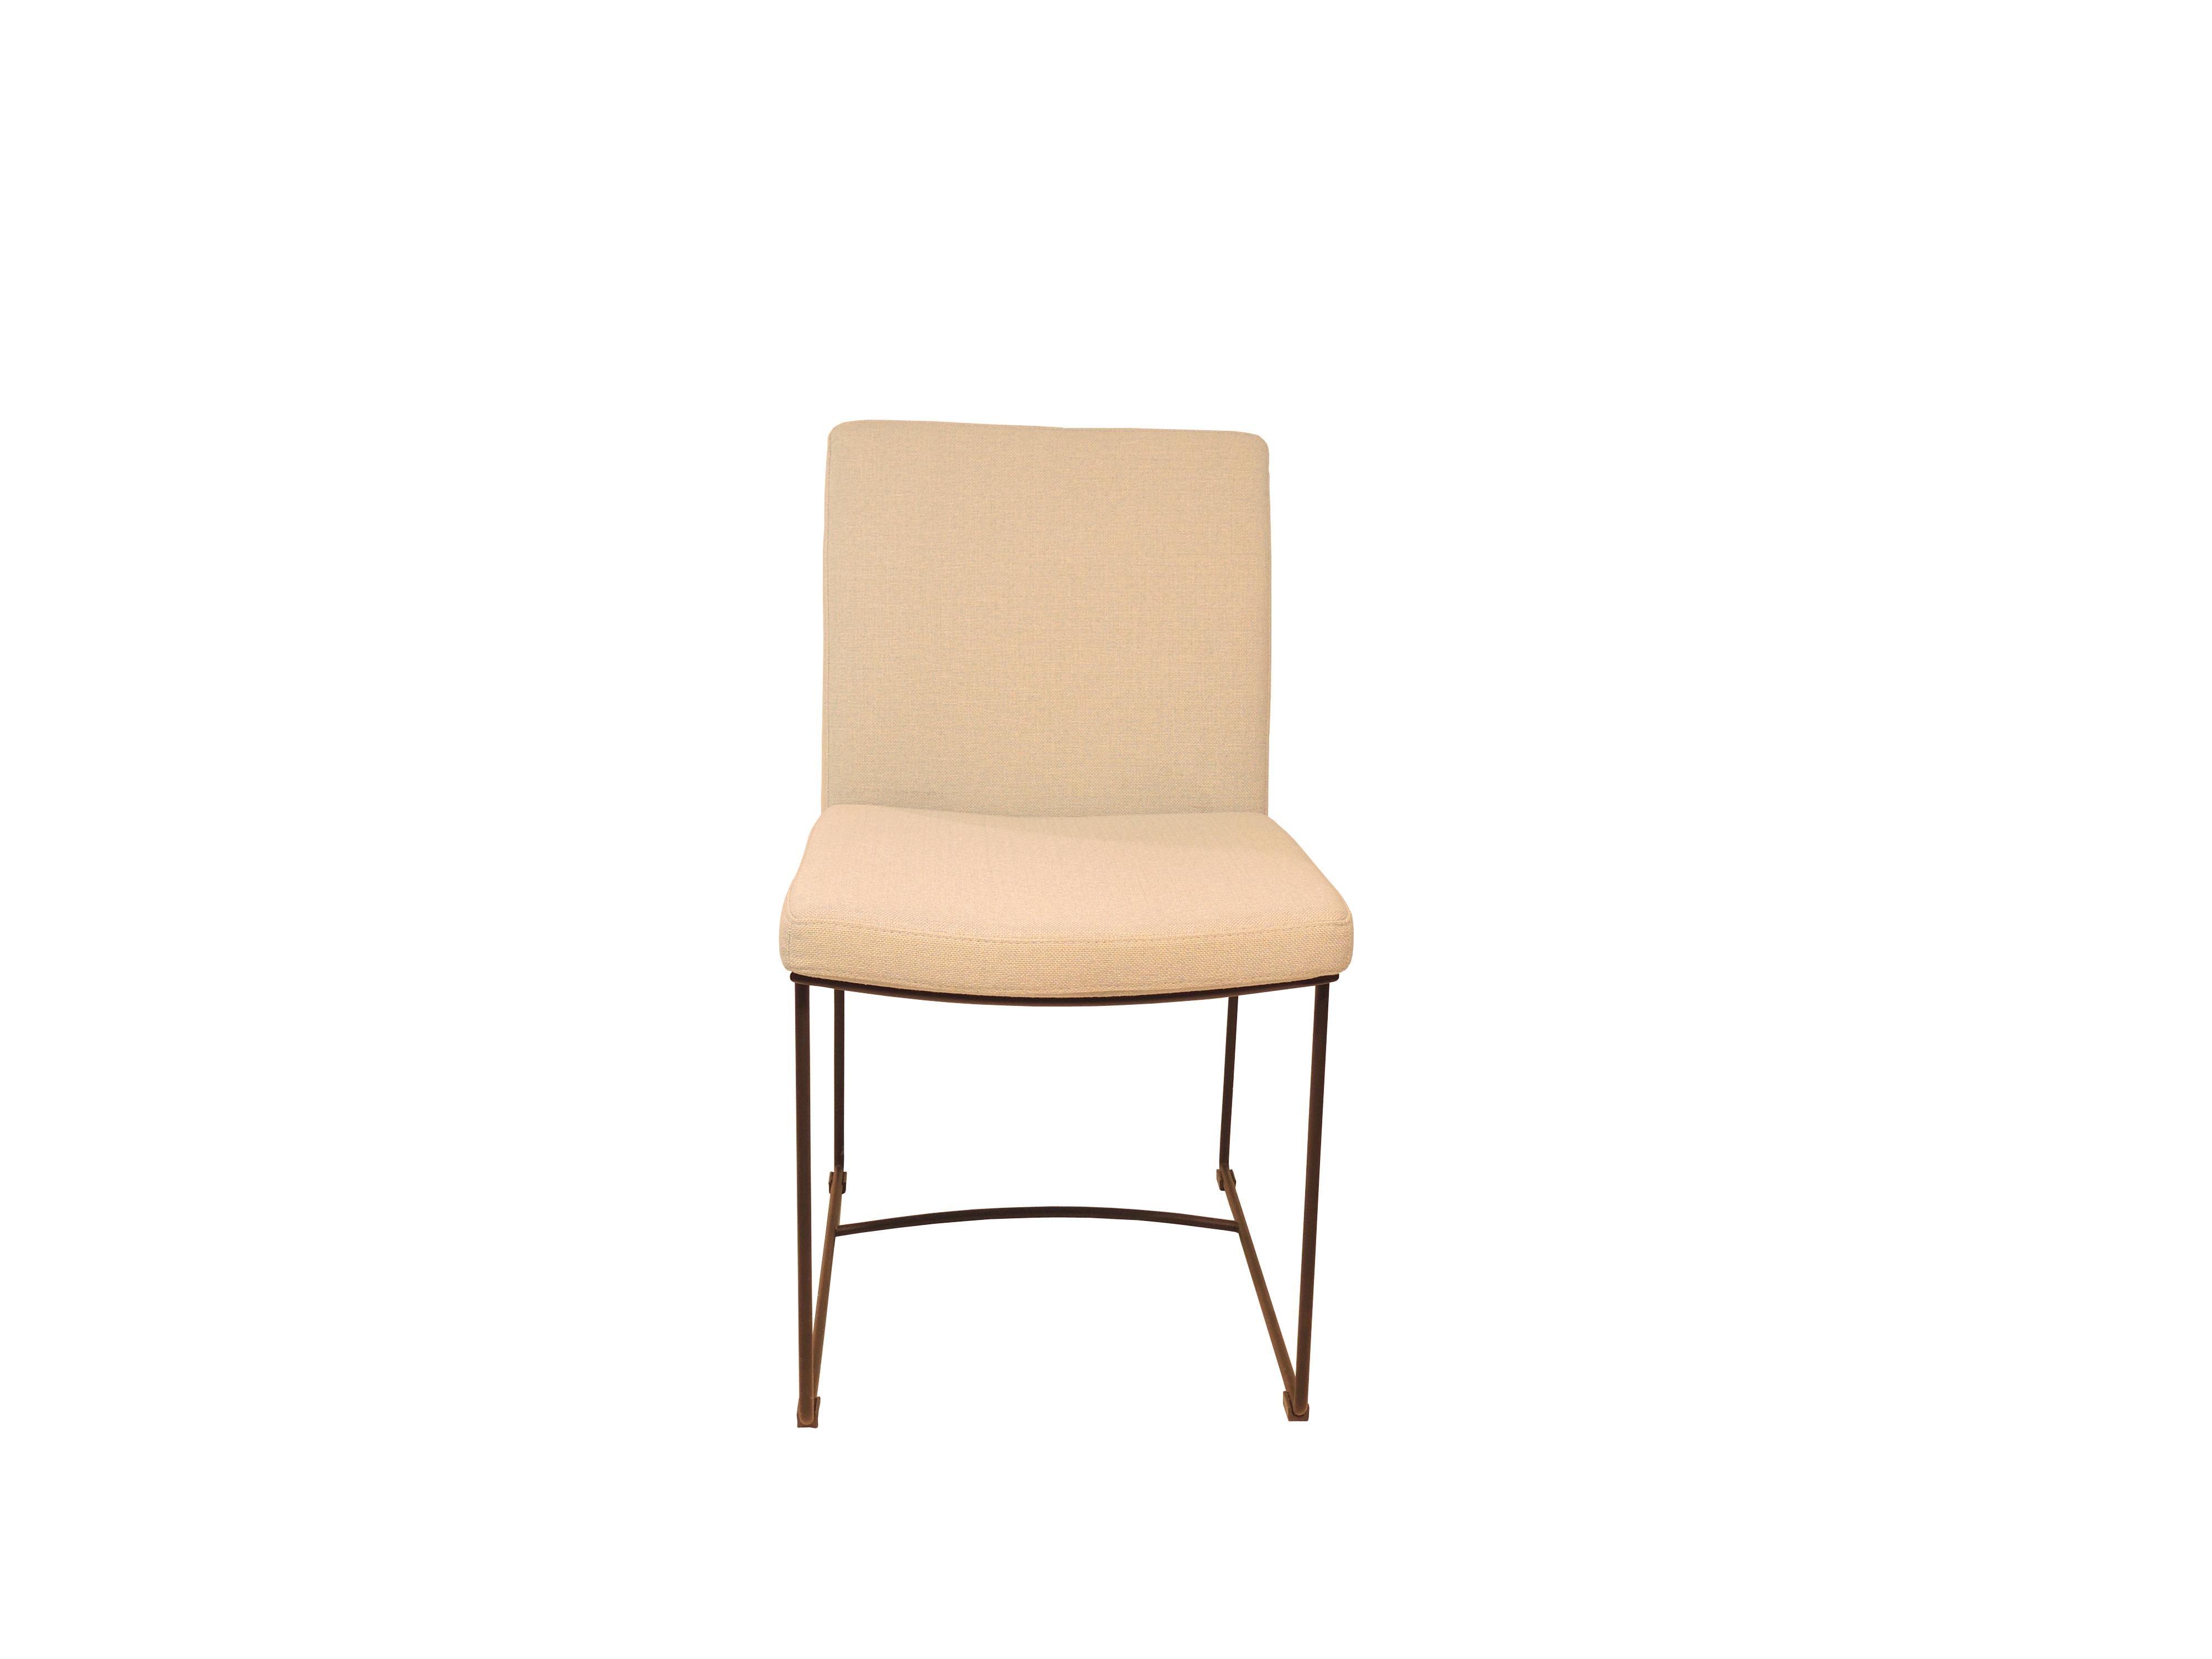 Zandro - Mat zwart stoel